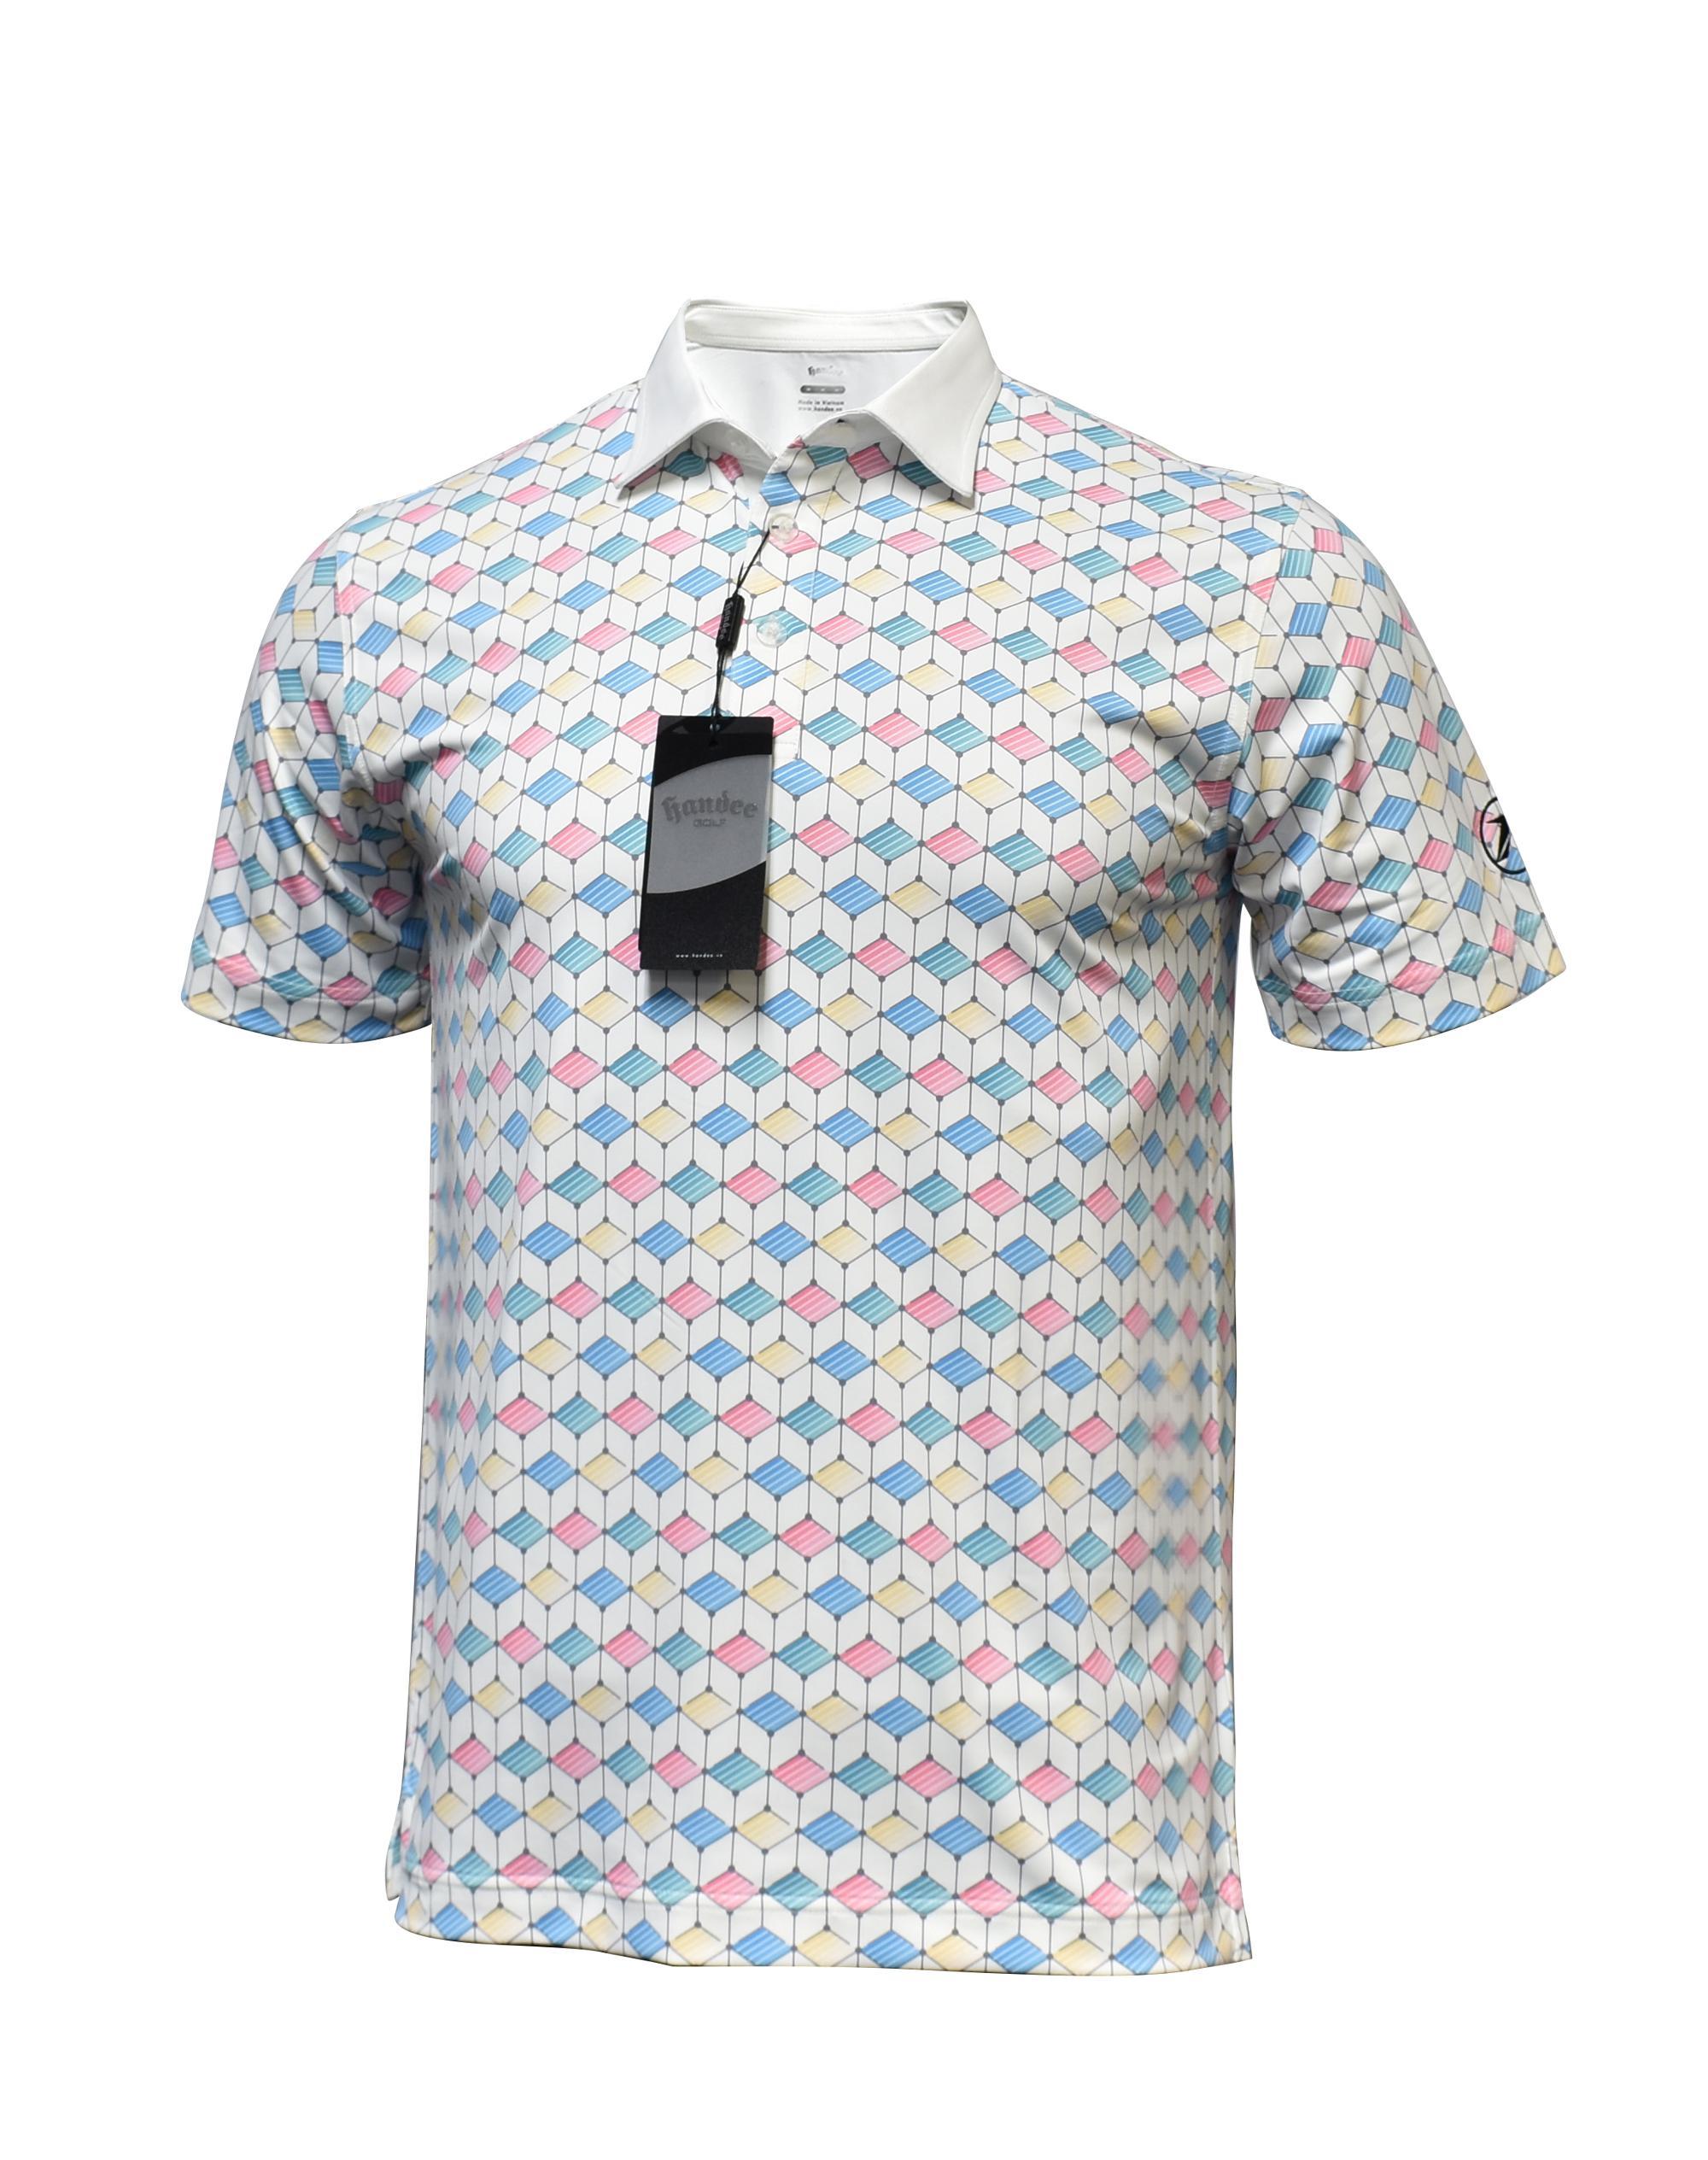 a2cecc5f Buy Golf Shirts Wholesale - DREAMWORKS